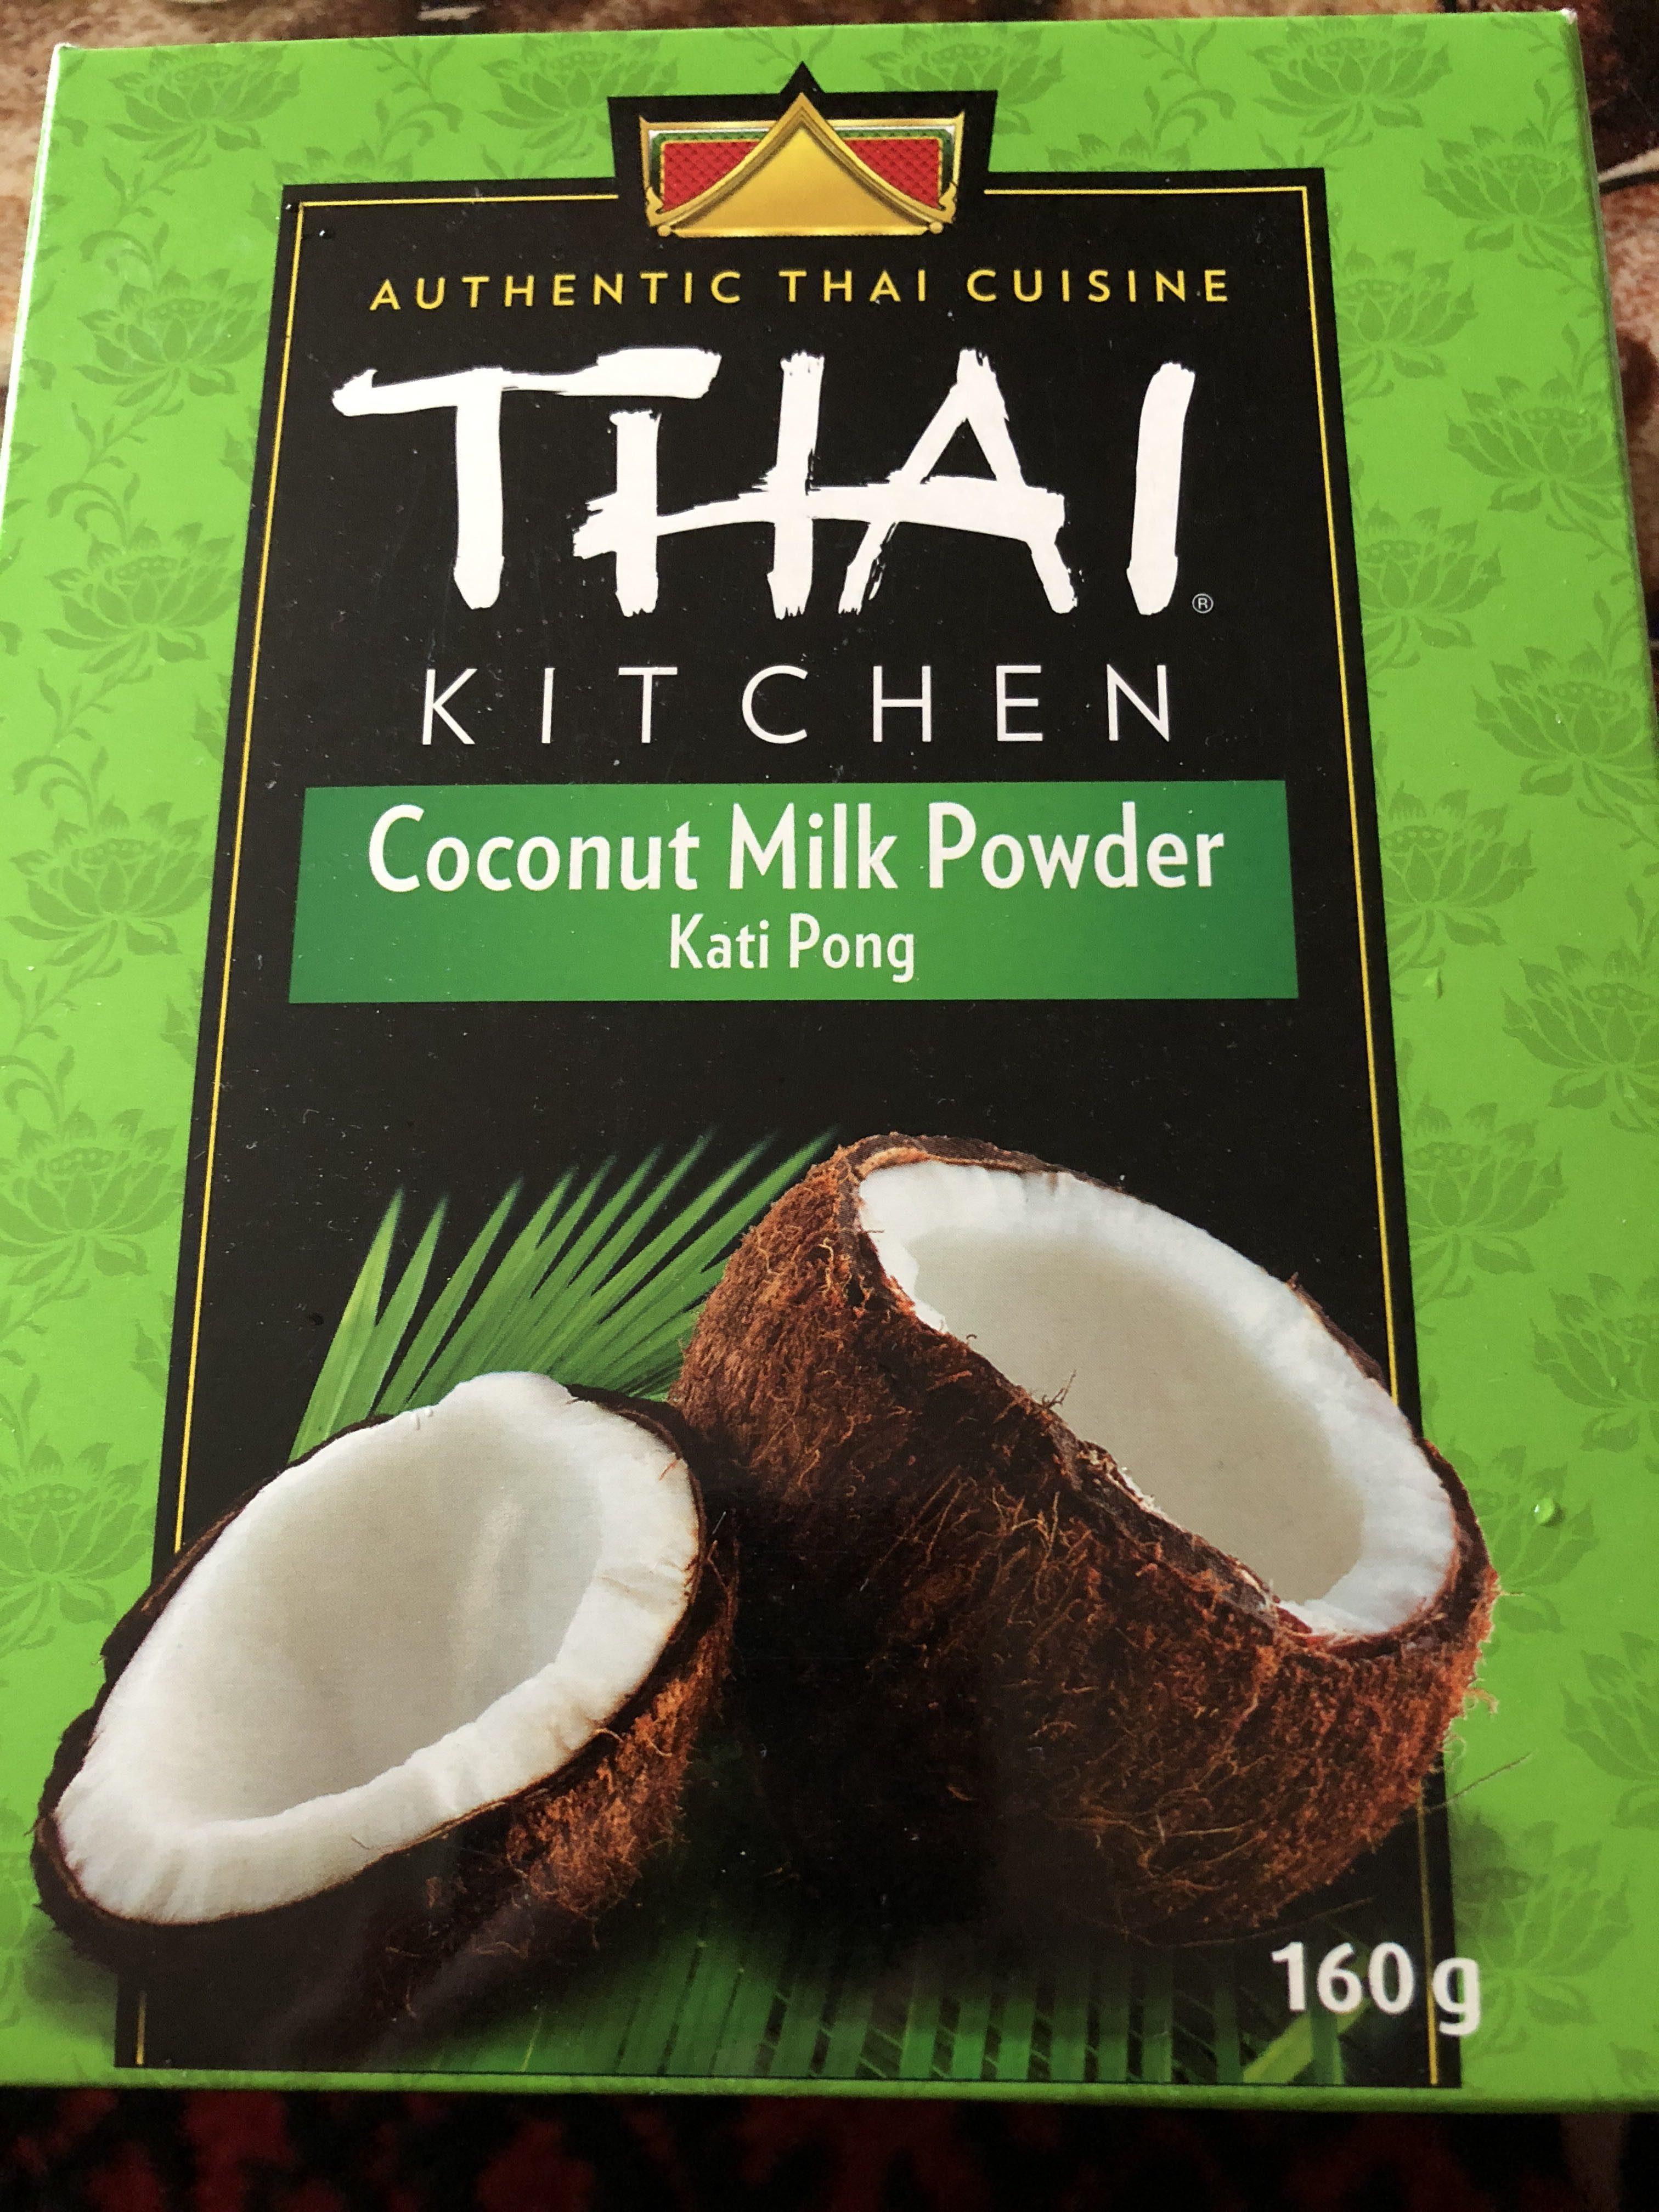 Sensational Coconut Milk Powder Kati Pong Thai Kitchen 160 G Interior Design Ideas Oxytryabchikinfo